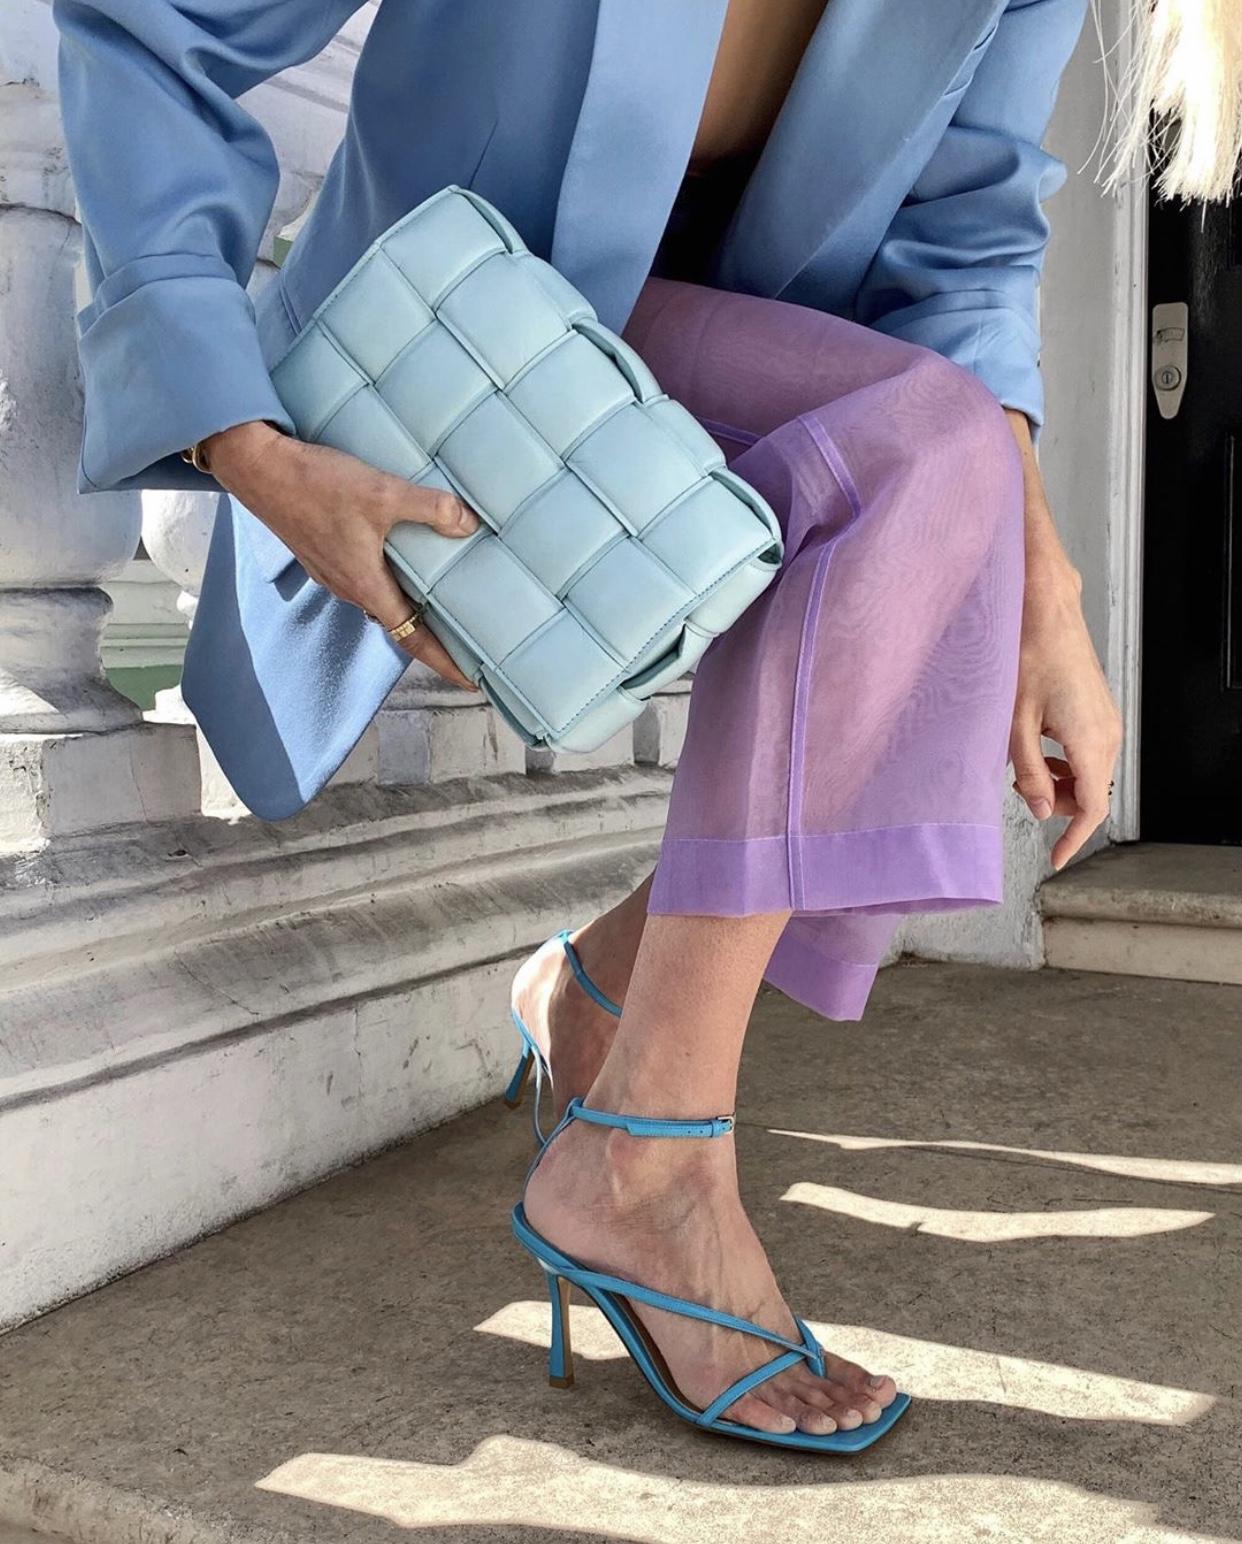 Turquoise Bottega Strappy Sandals